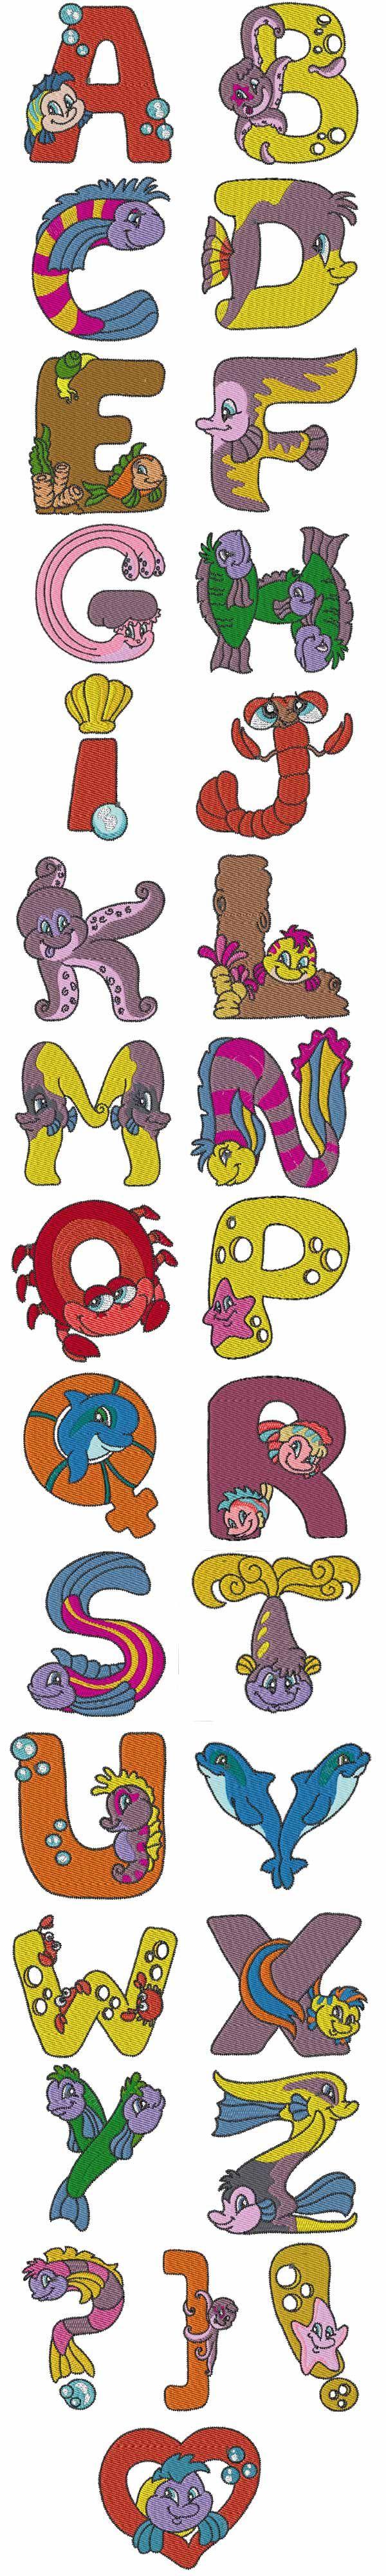 5 Letter Cartoon Characters : Best alphabet cartoons images on pinterest letters